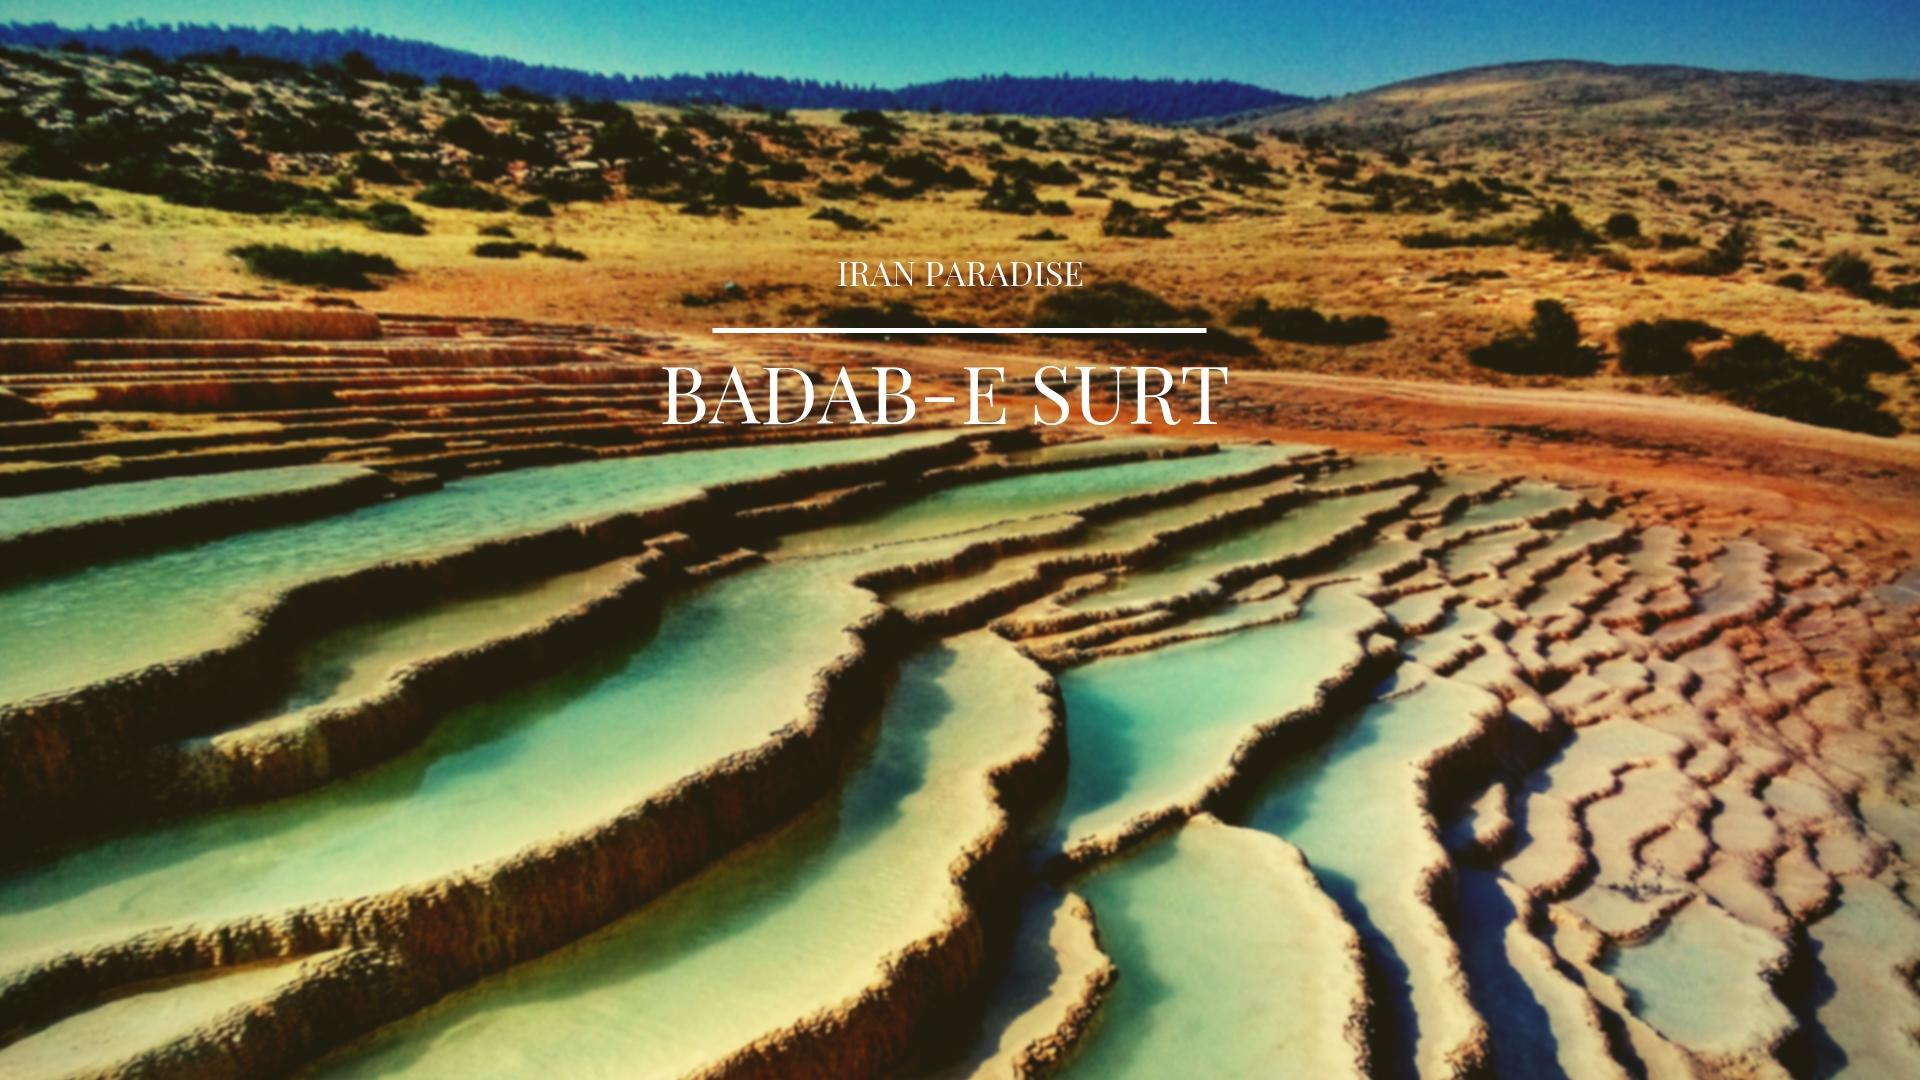 Badab-e Surt